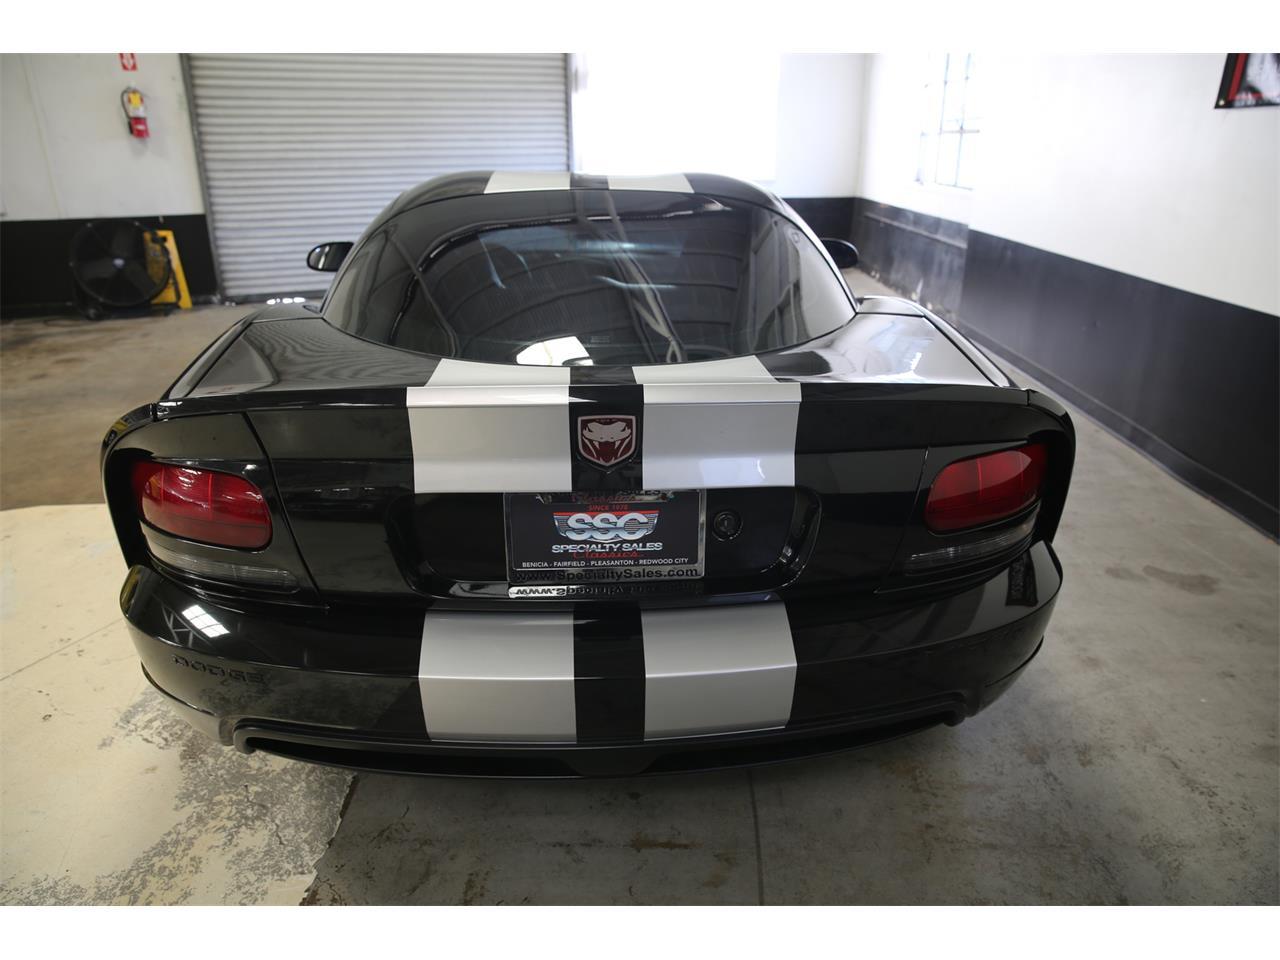 For Sale: 2006 Dodge SRT10 in Fairfield, California